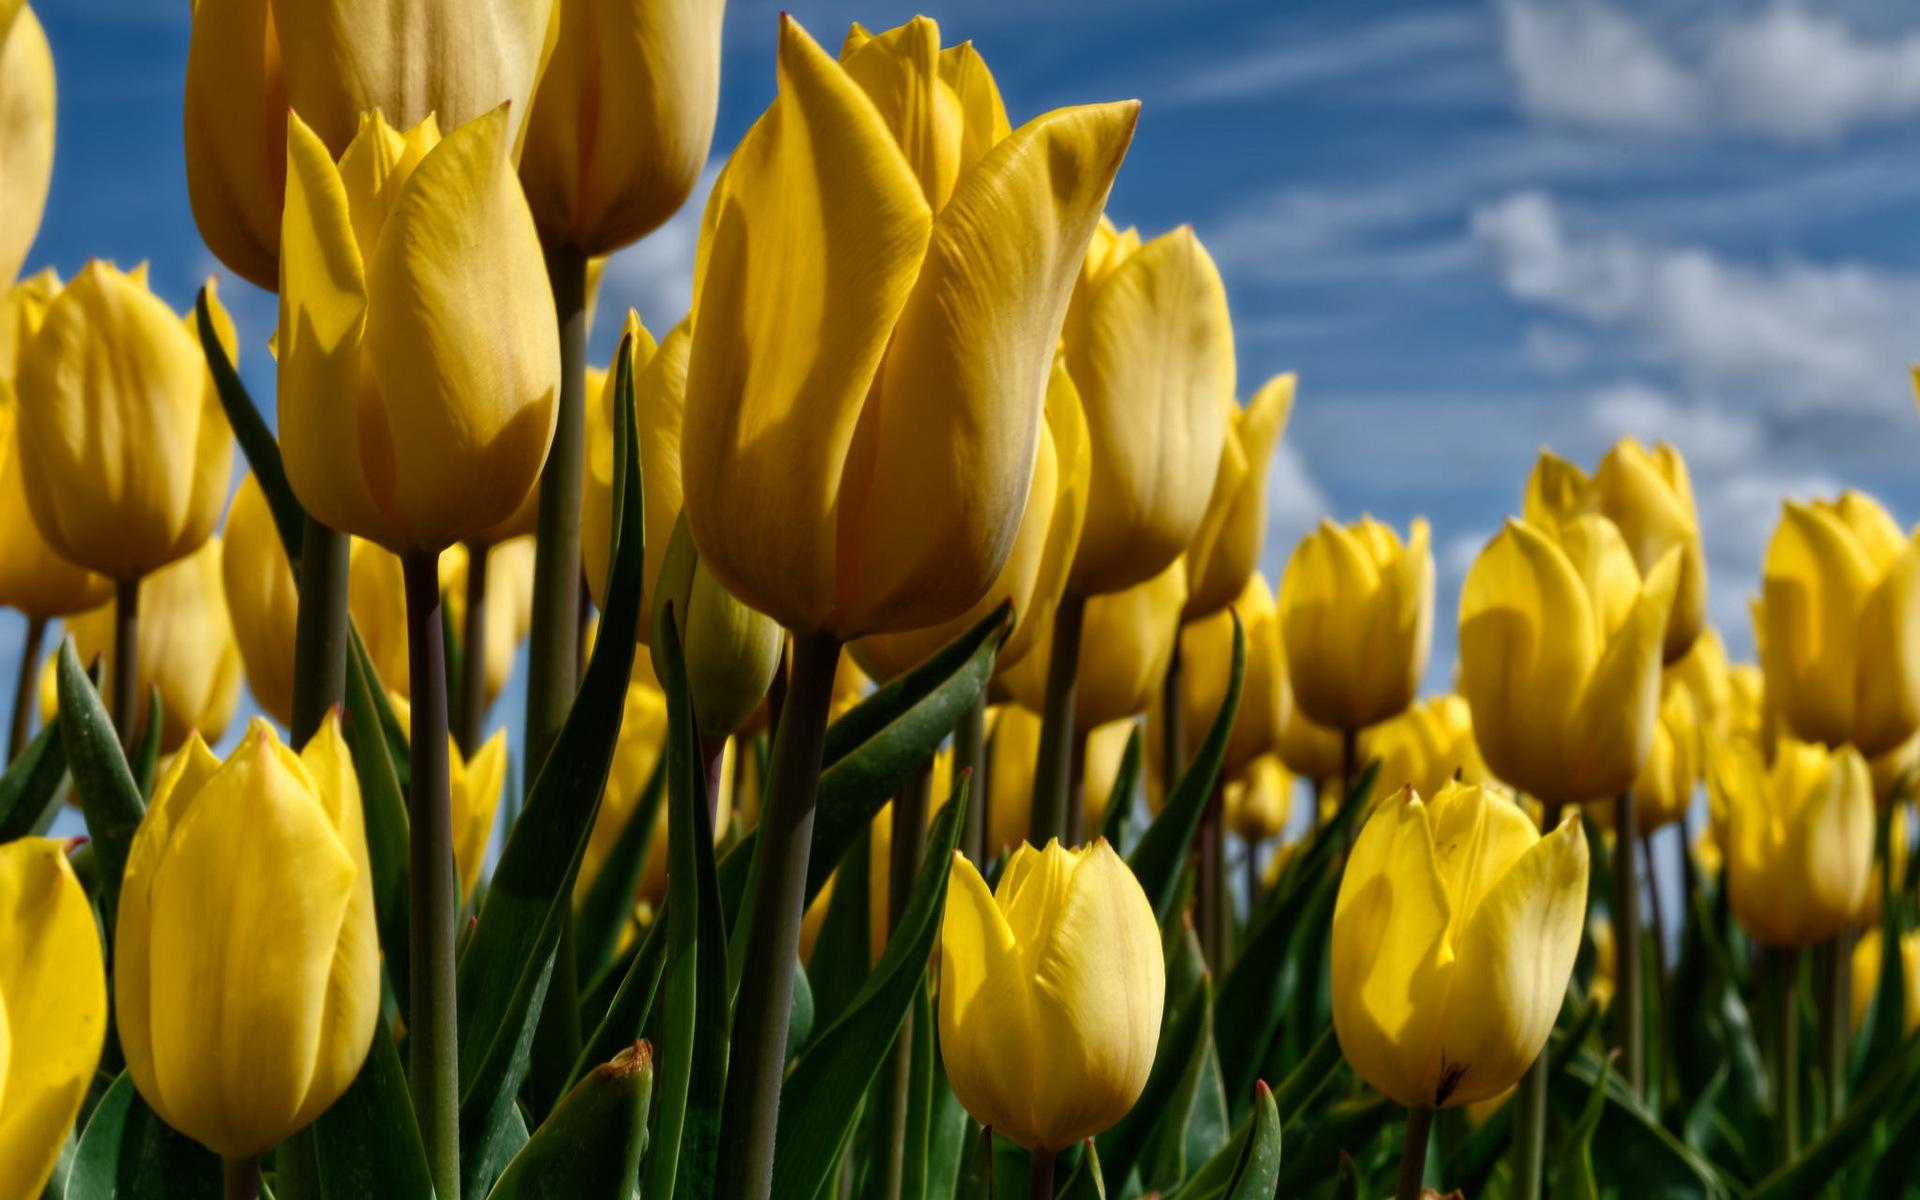 Желтые тюльпаны в картинках